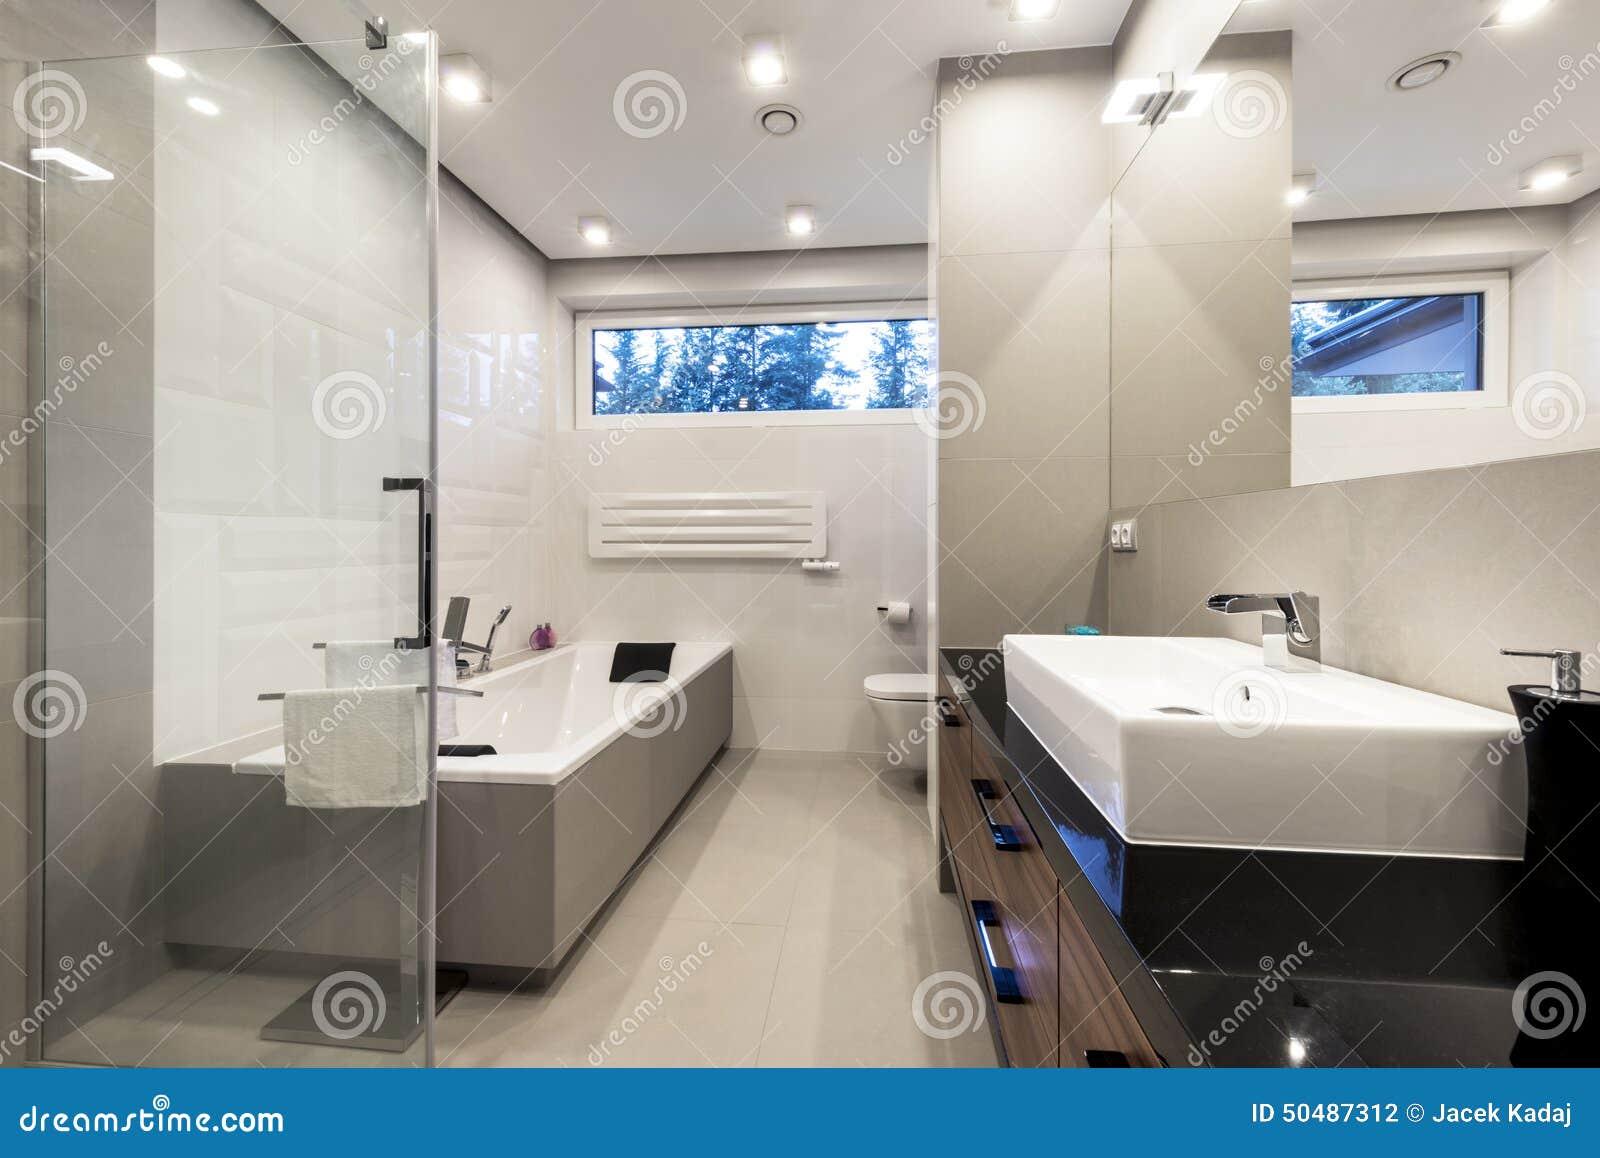 Bathroom with bath tub white wraparound curtain royalty for Badezimmer modern